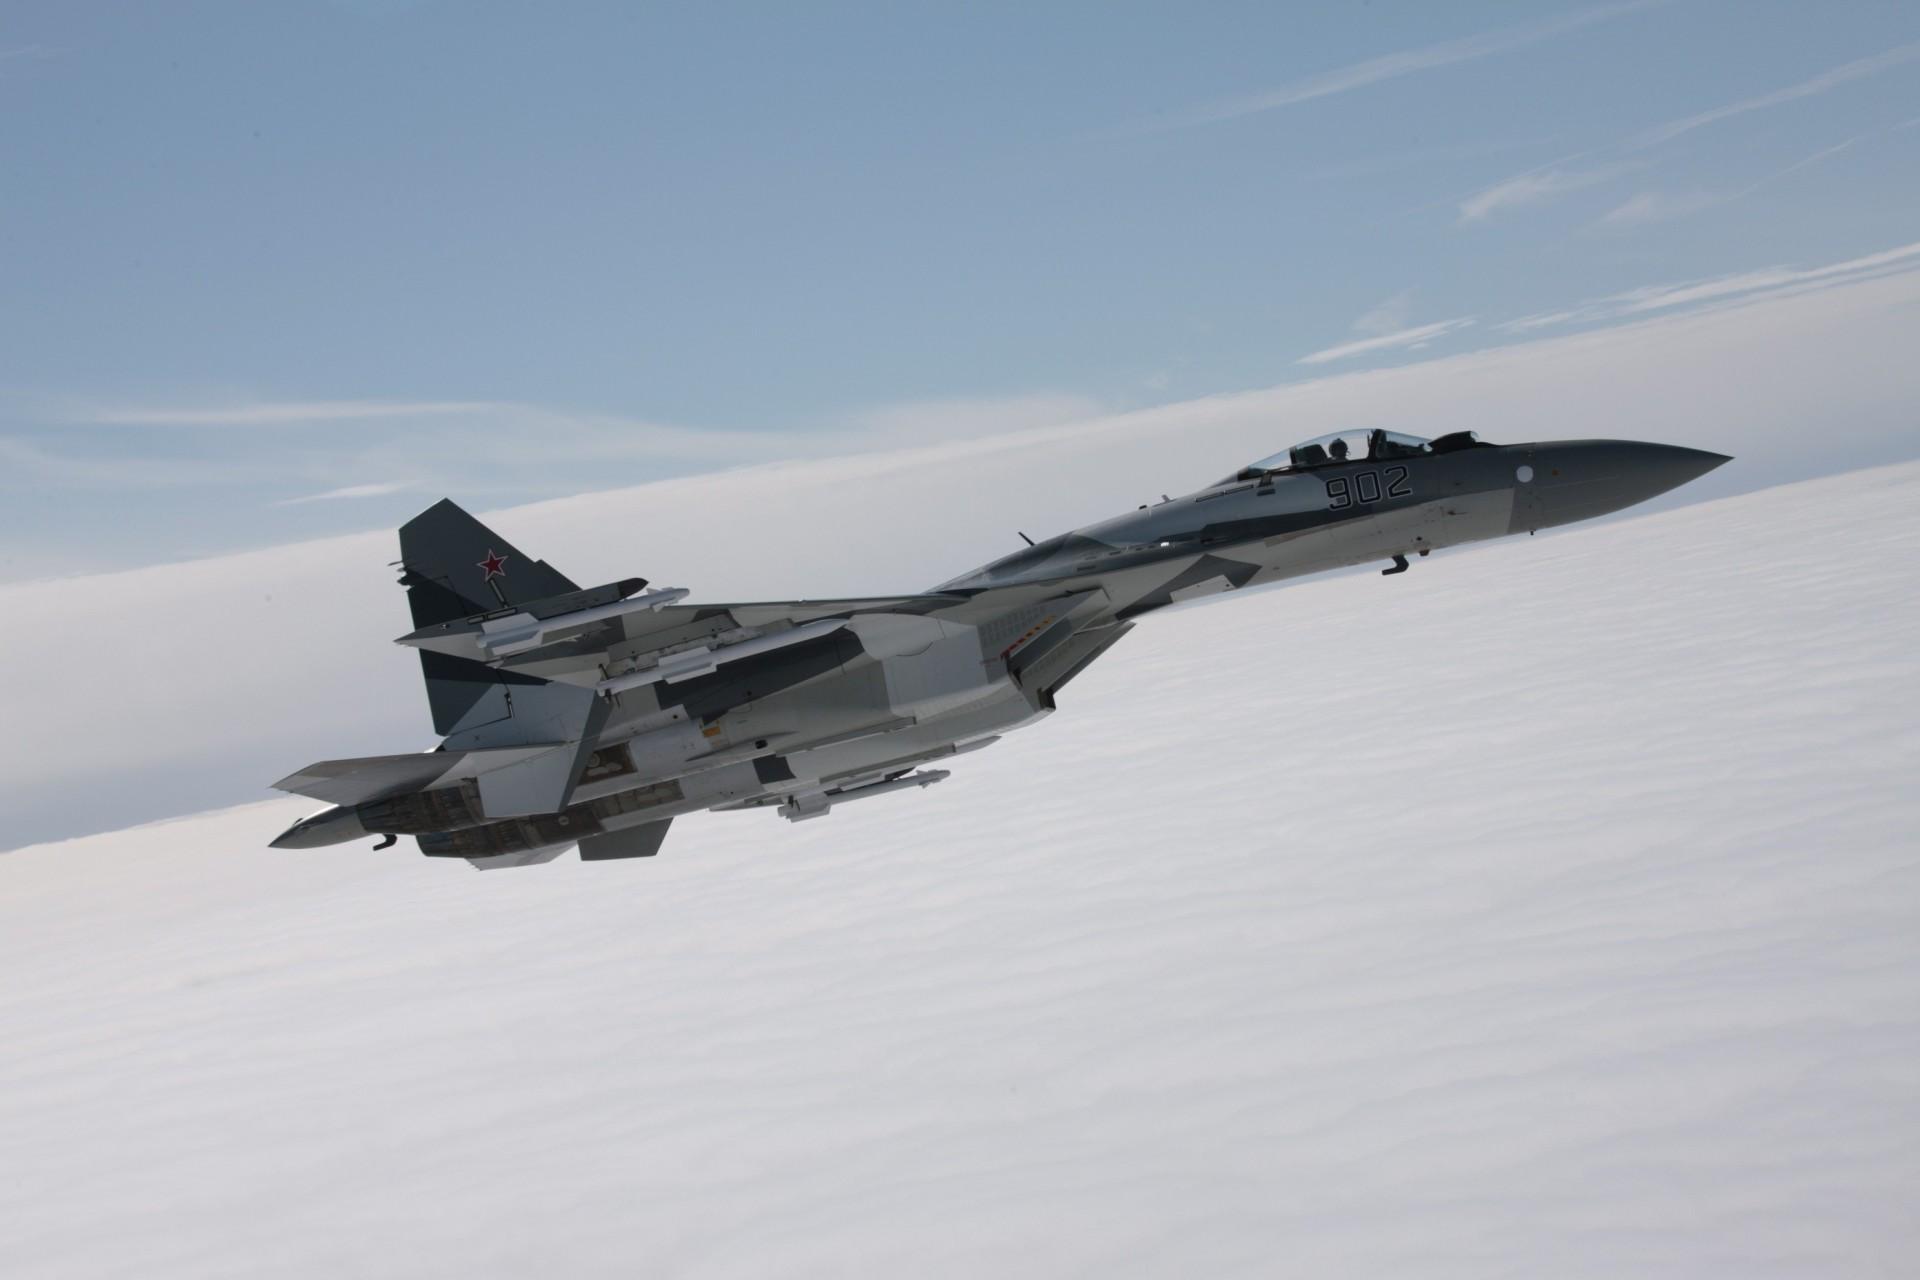 Обои Mcdonnell douglas, истребитель, Самолёт, eagle, Облака. Авиация foto 11